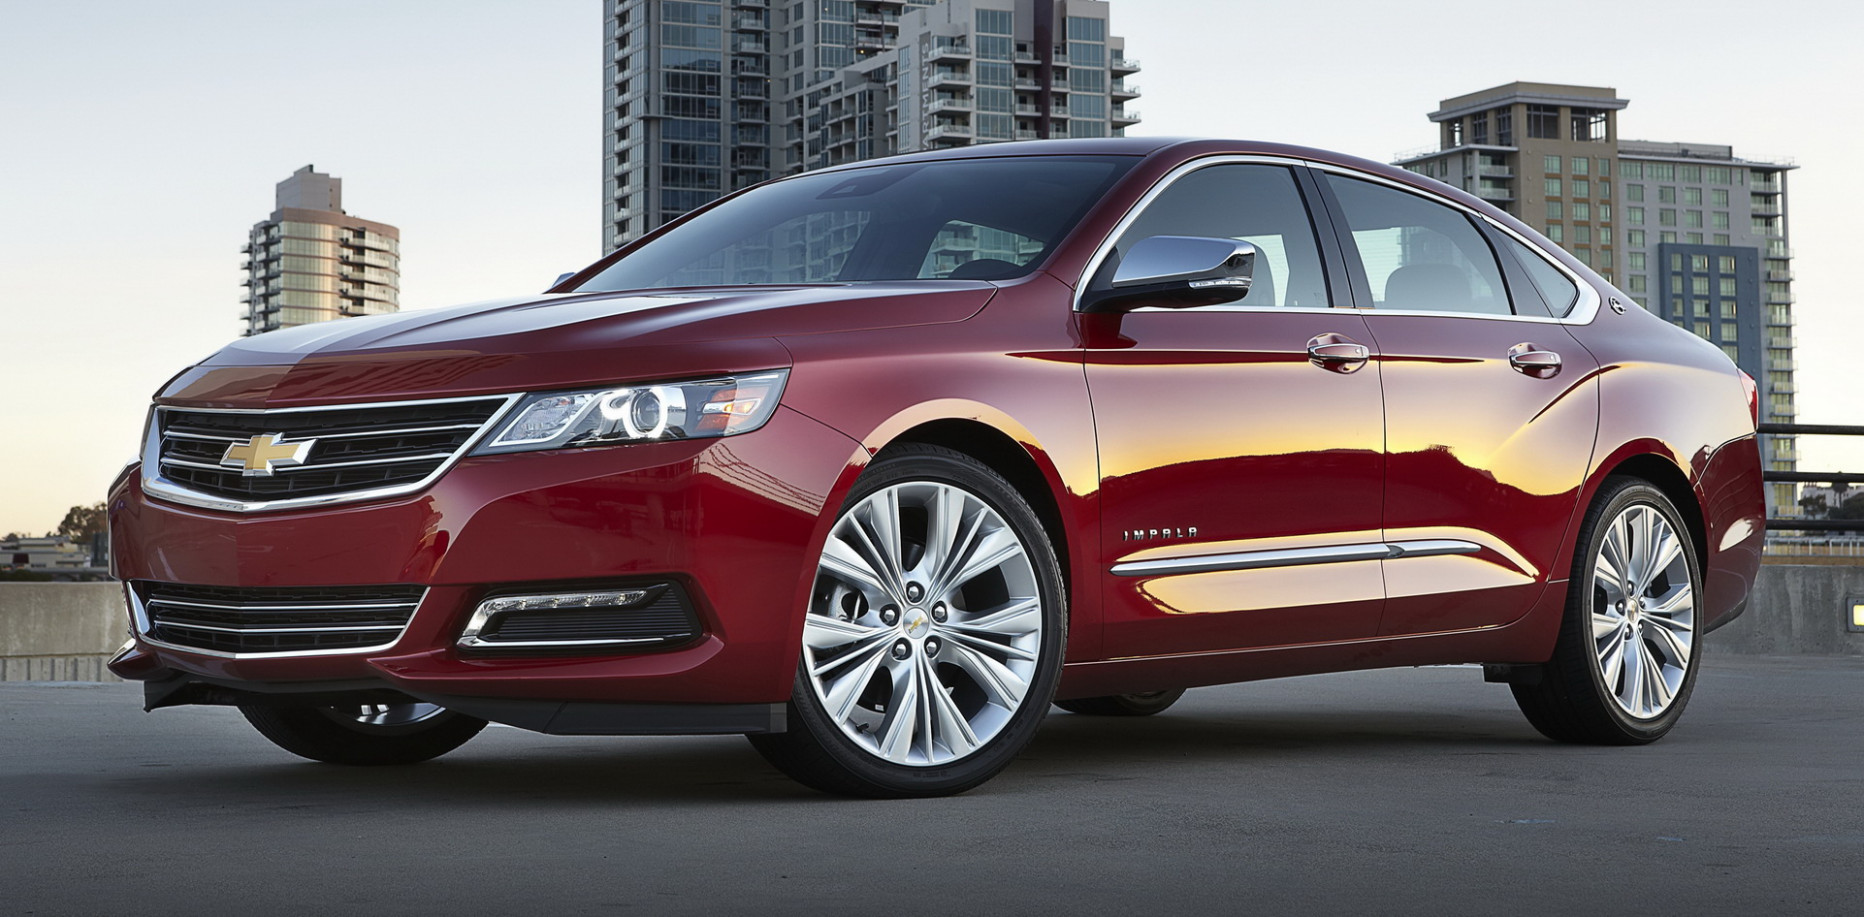 Model 2022 Chevy Impala SS